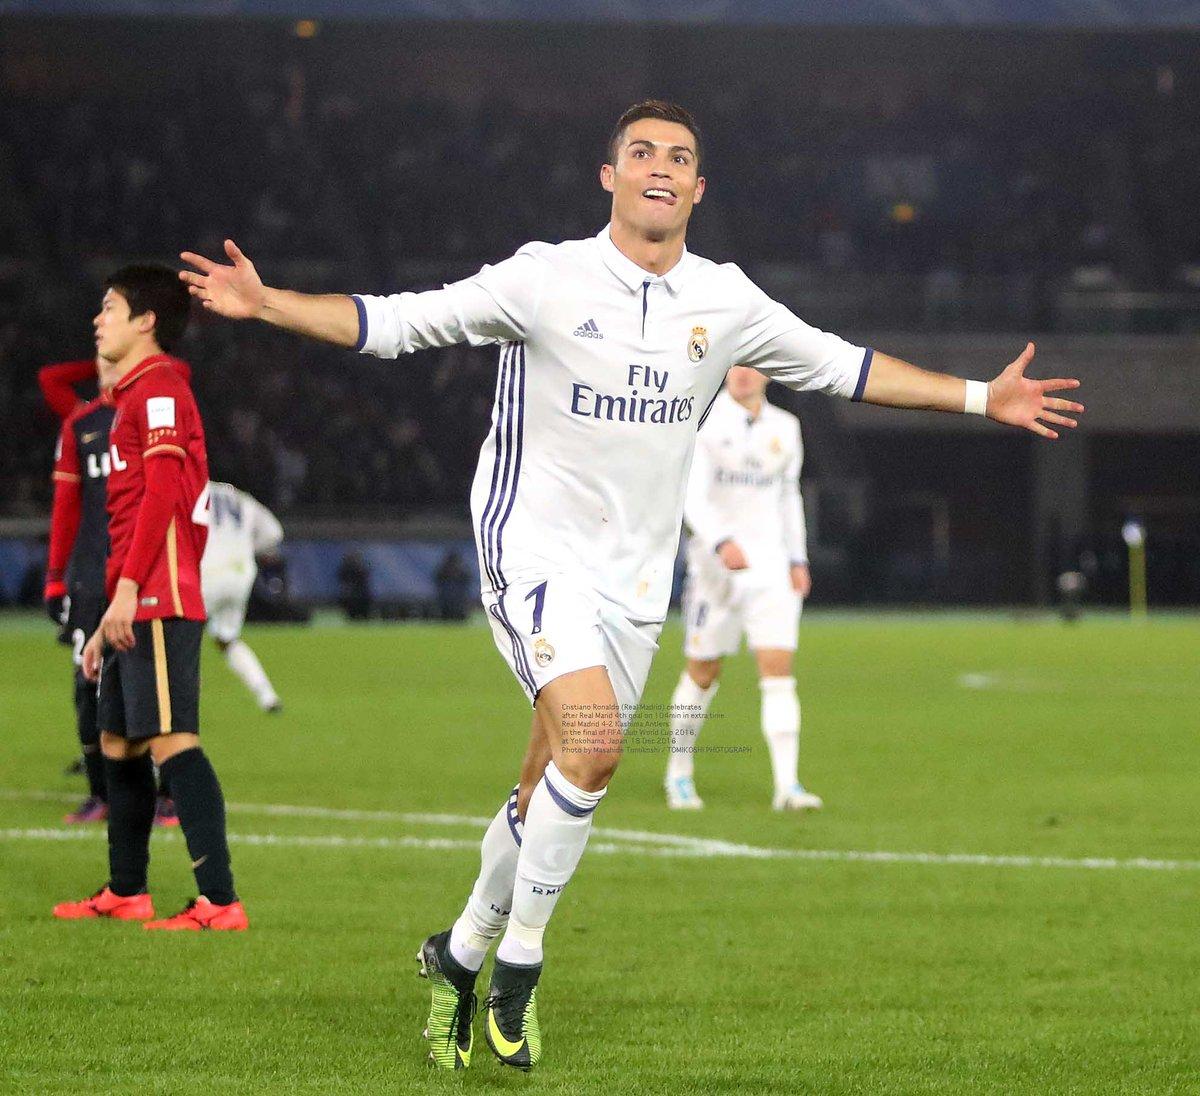 Tphoto On Twitter Cristiano Ronaldo Real Madrid Celebrates